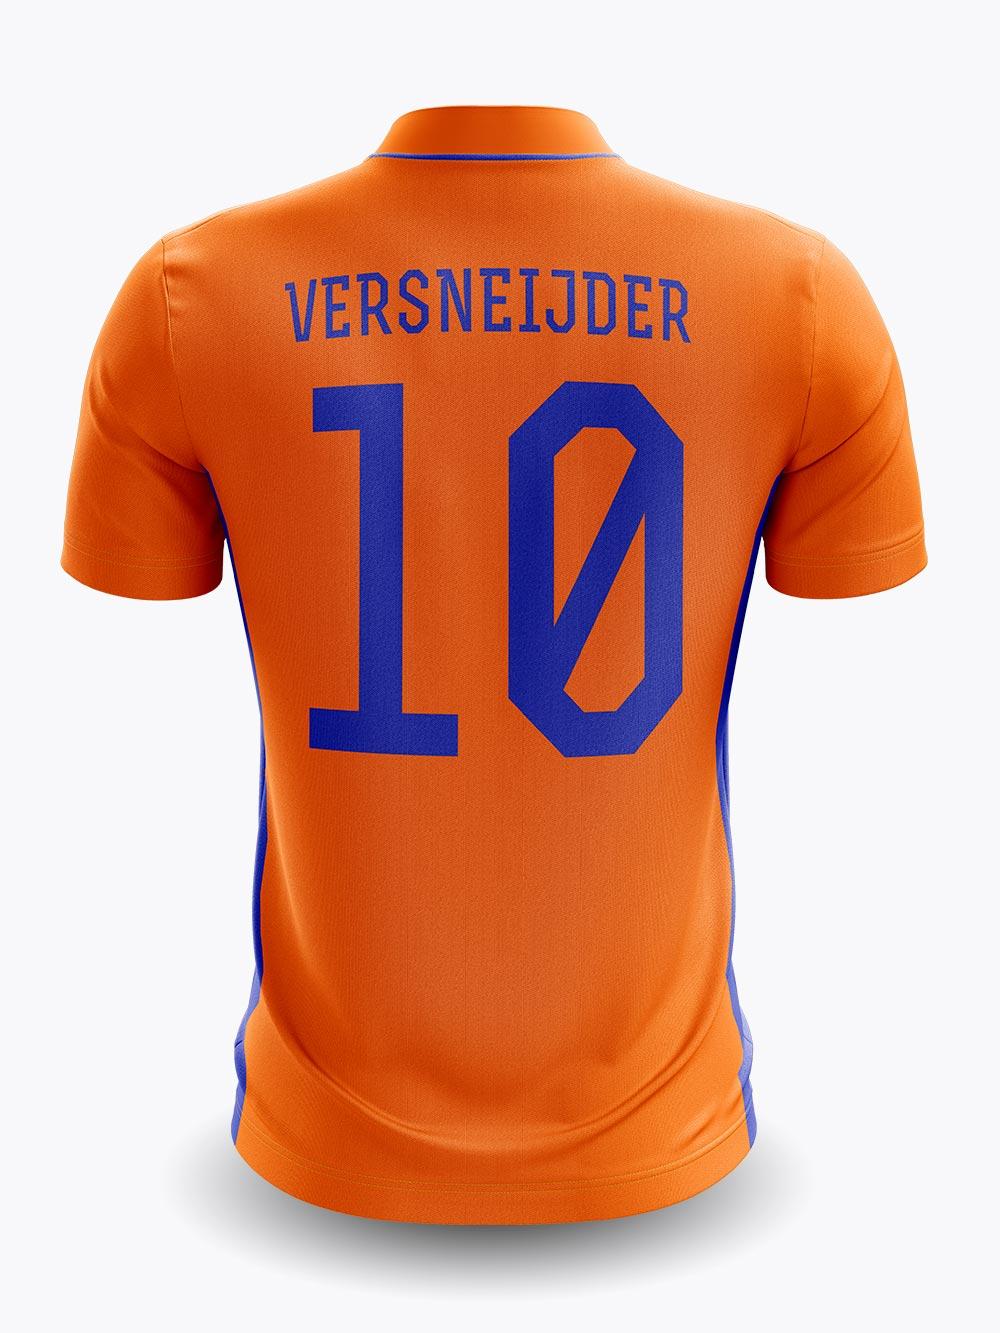 versneijder-shirt